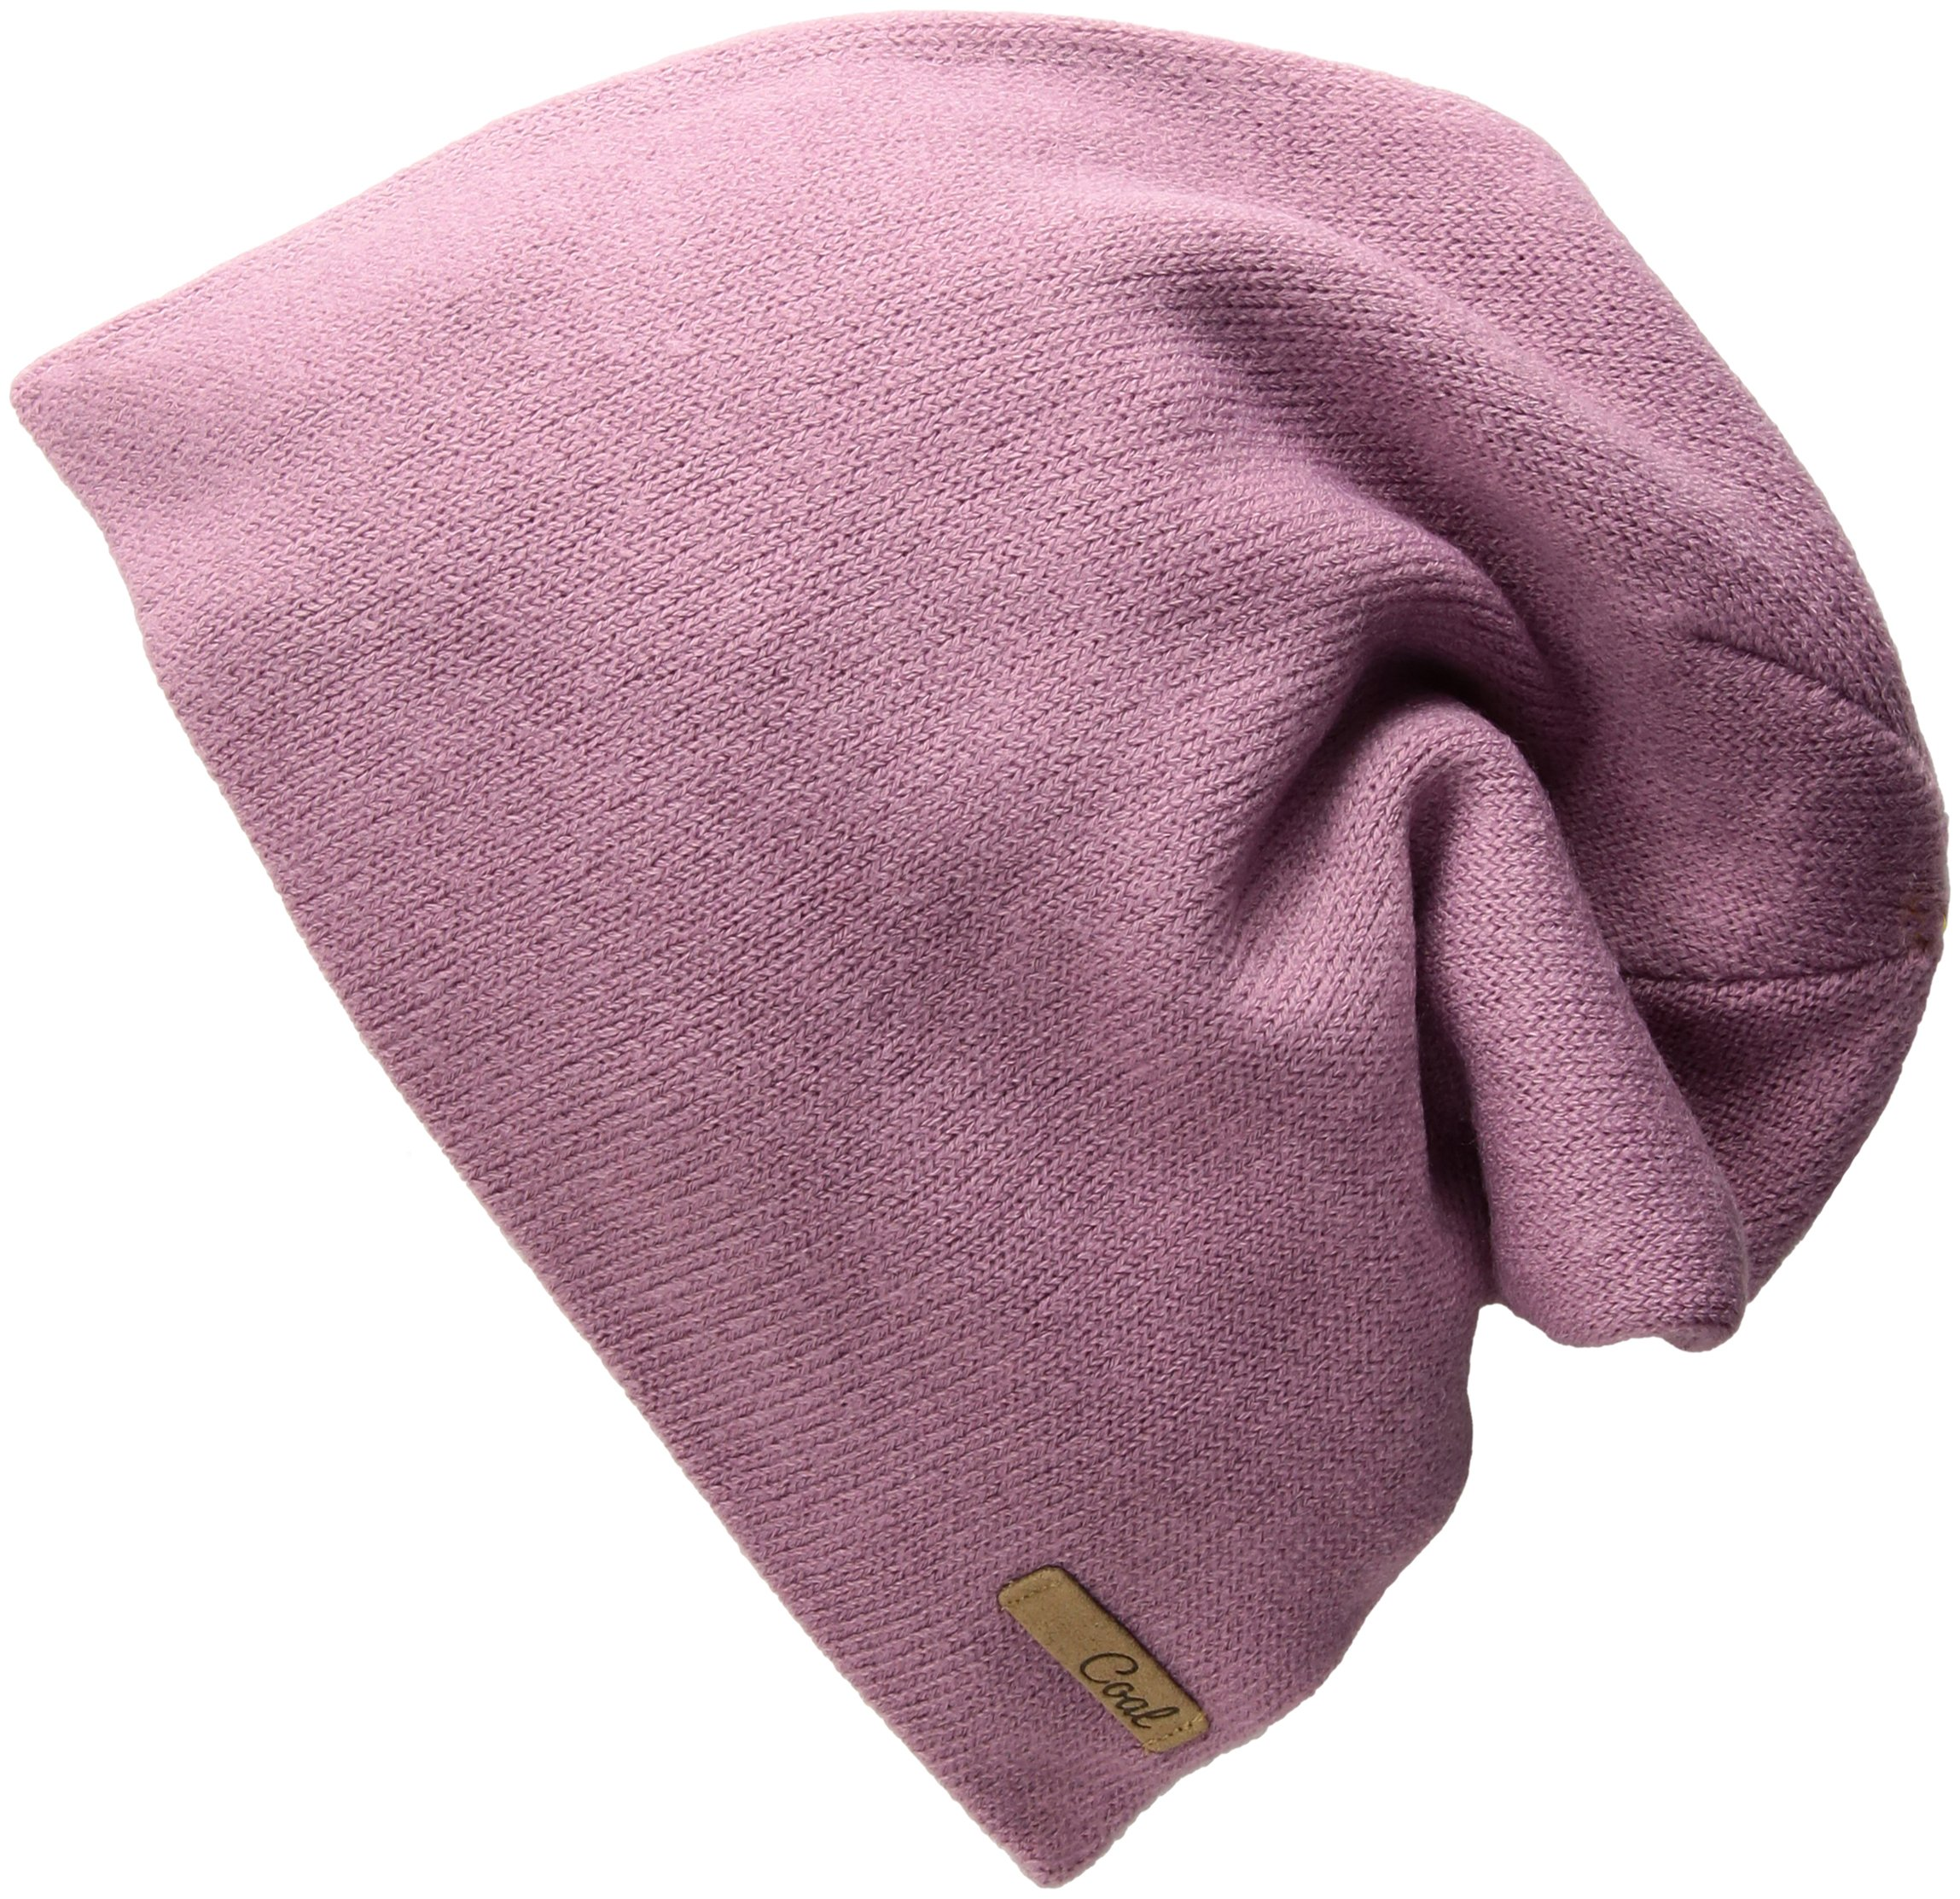 Coal Women's The Julietta Soft Fine Knit Slouchy Fashion Beanie Hat, Mauve, One Size